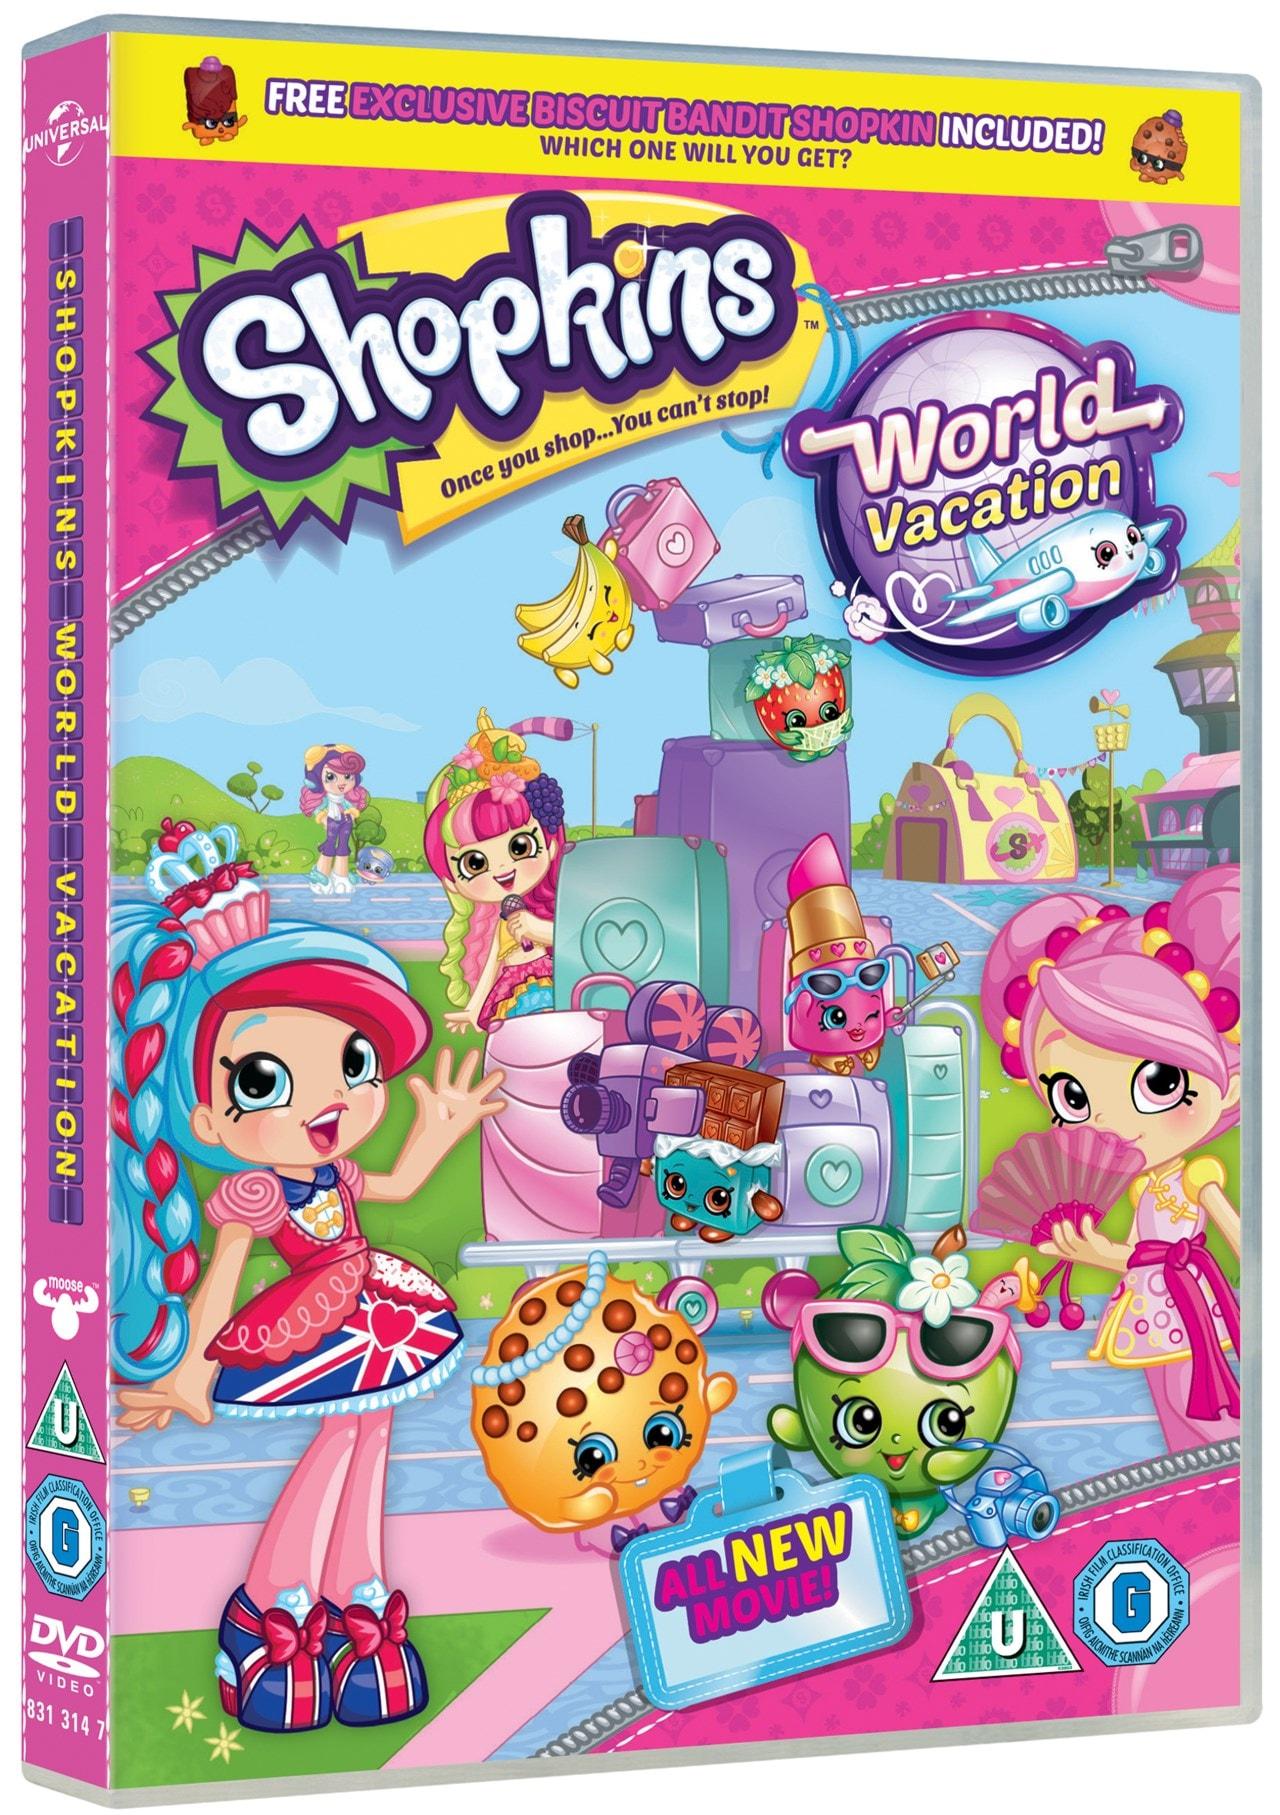 Shopkins: World Vacation - 2